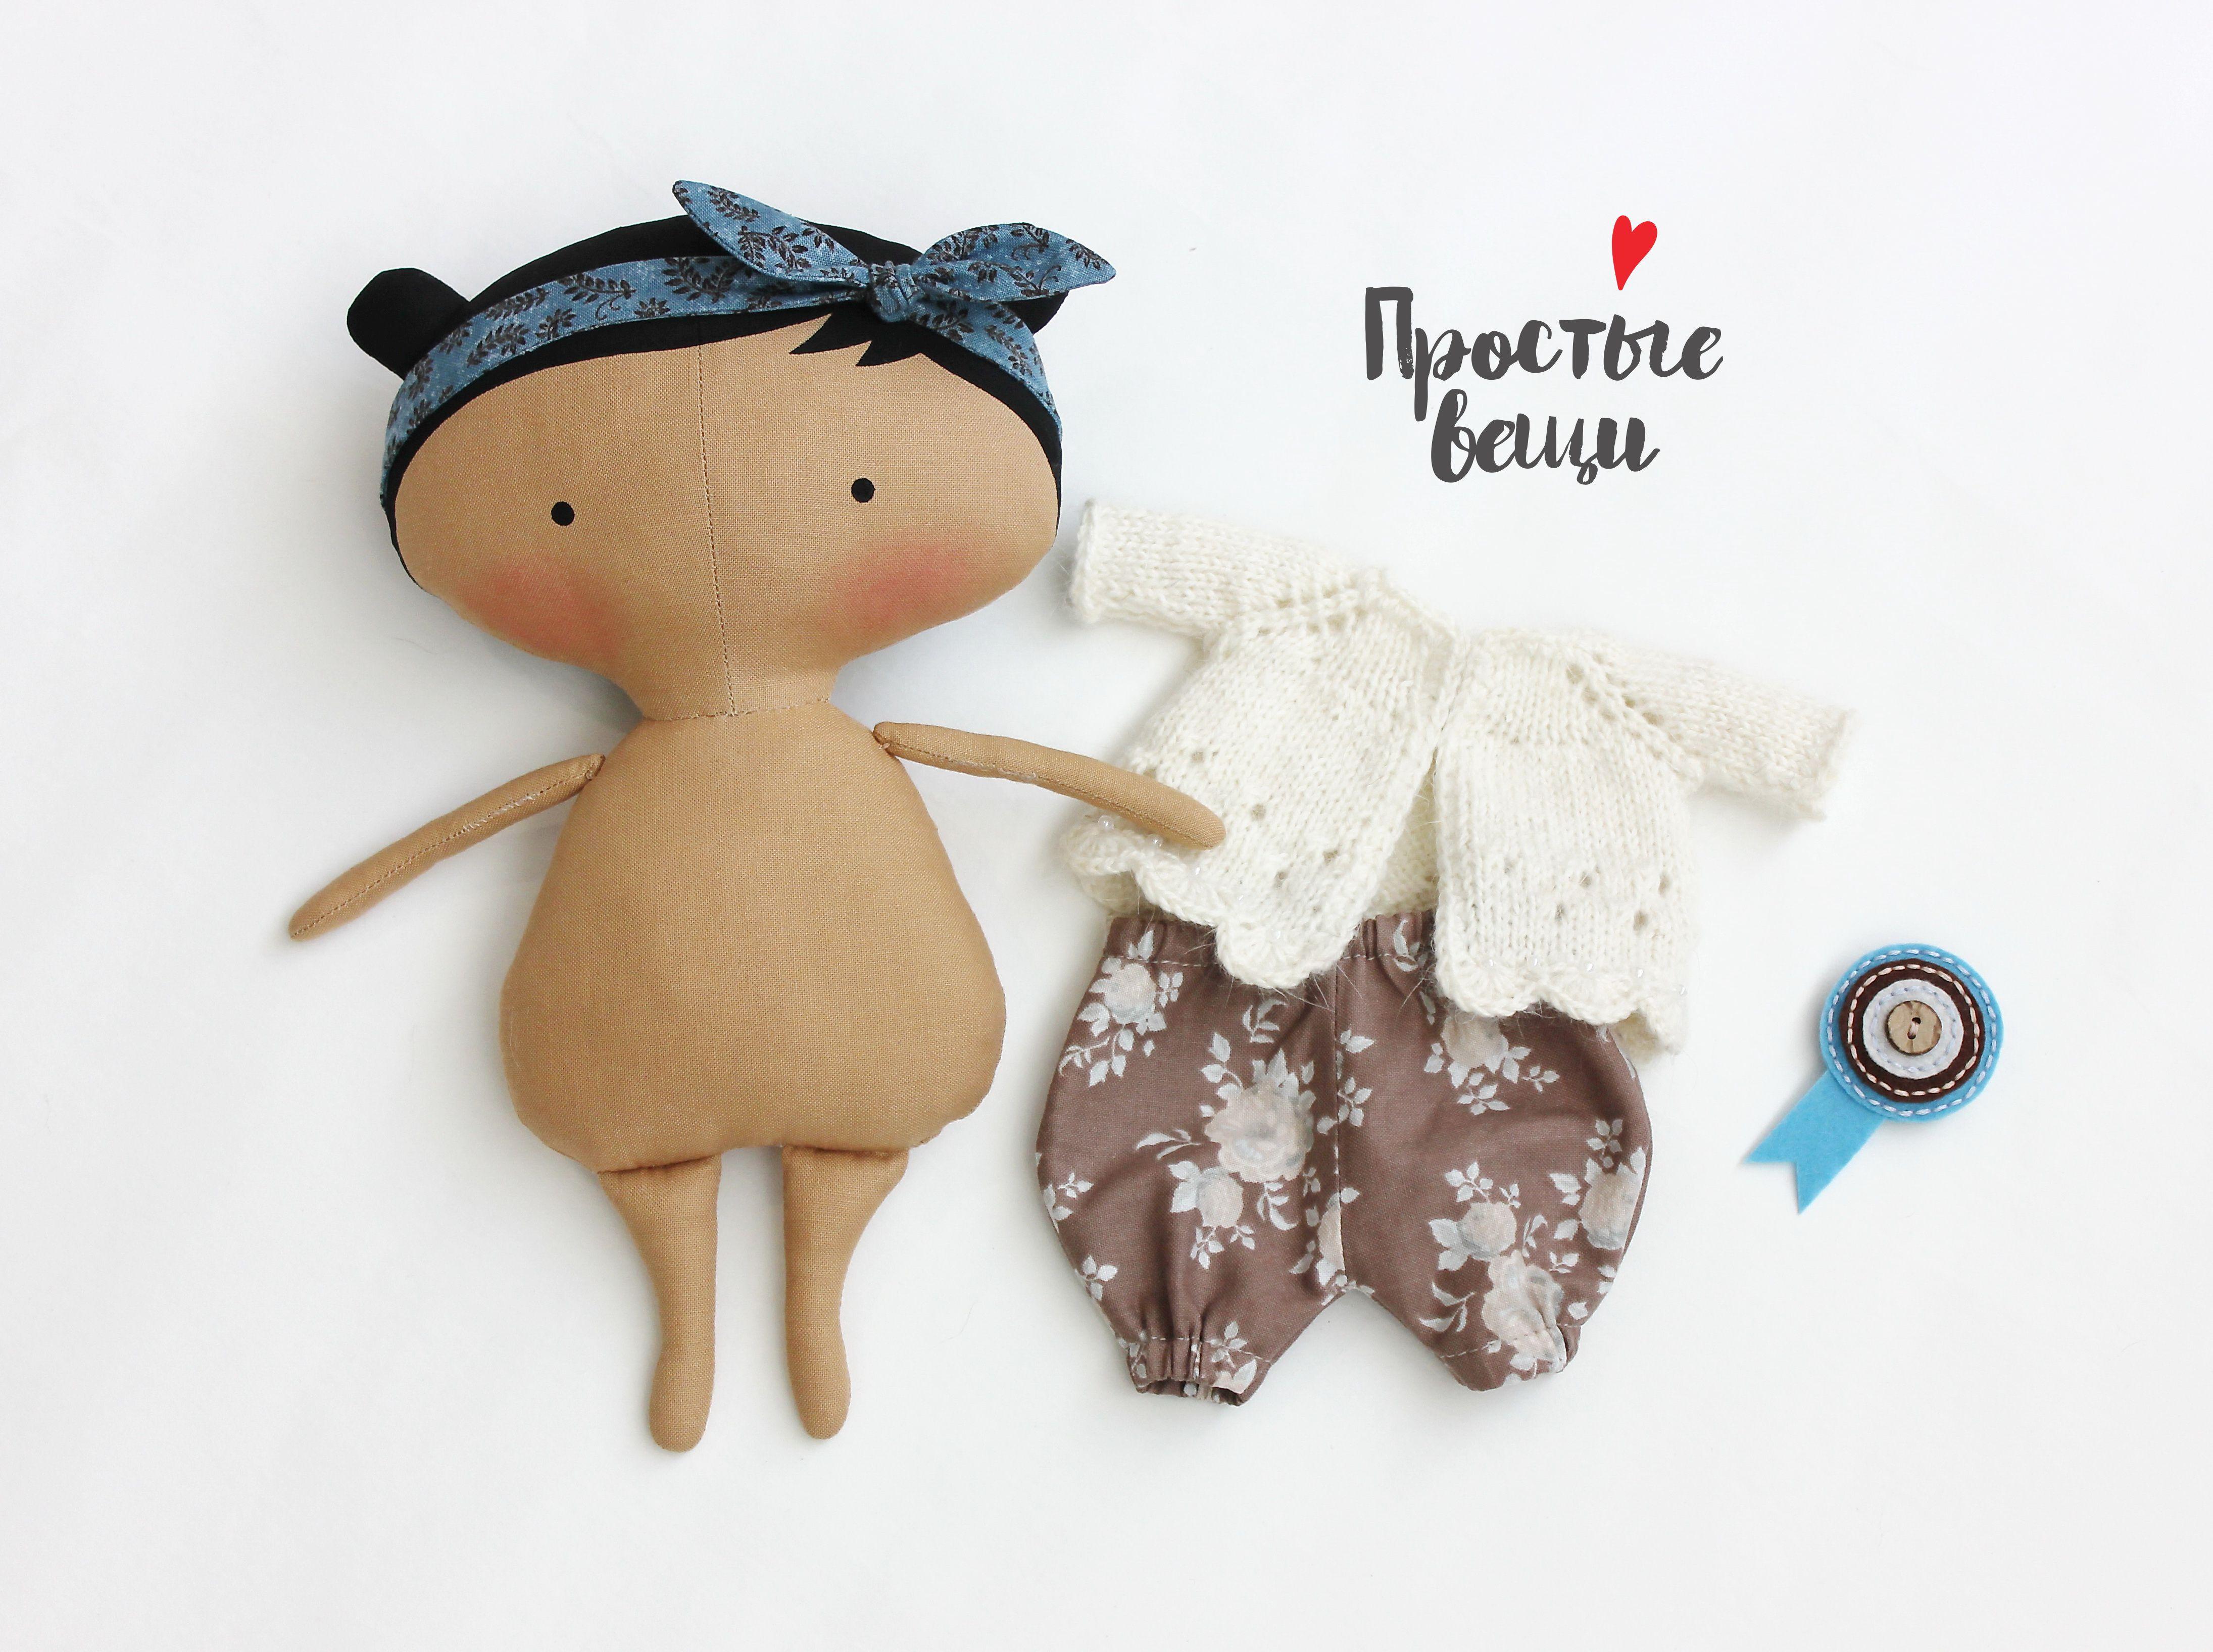 интерьернаякукла тильда кукла игроваякукла